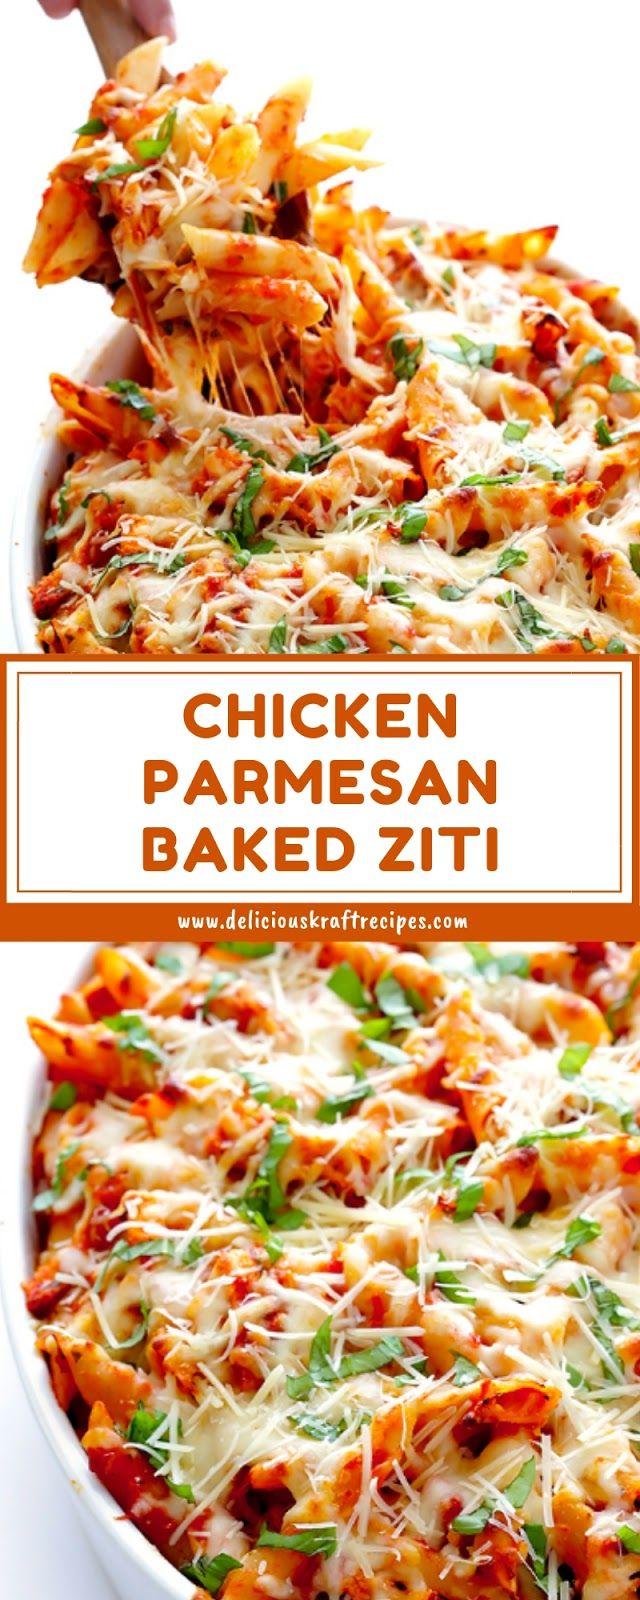 CHICKEN PARMESAN BAKED ZITI #chickenparmesan